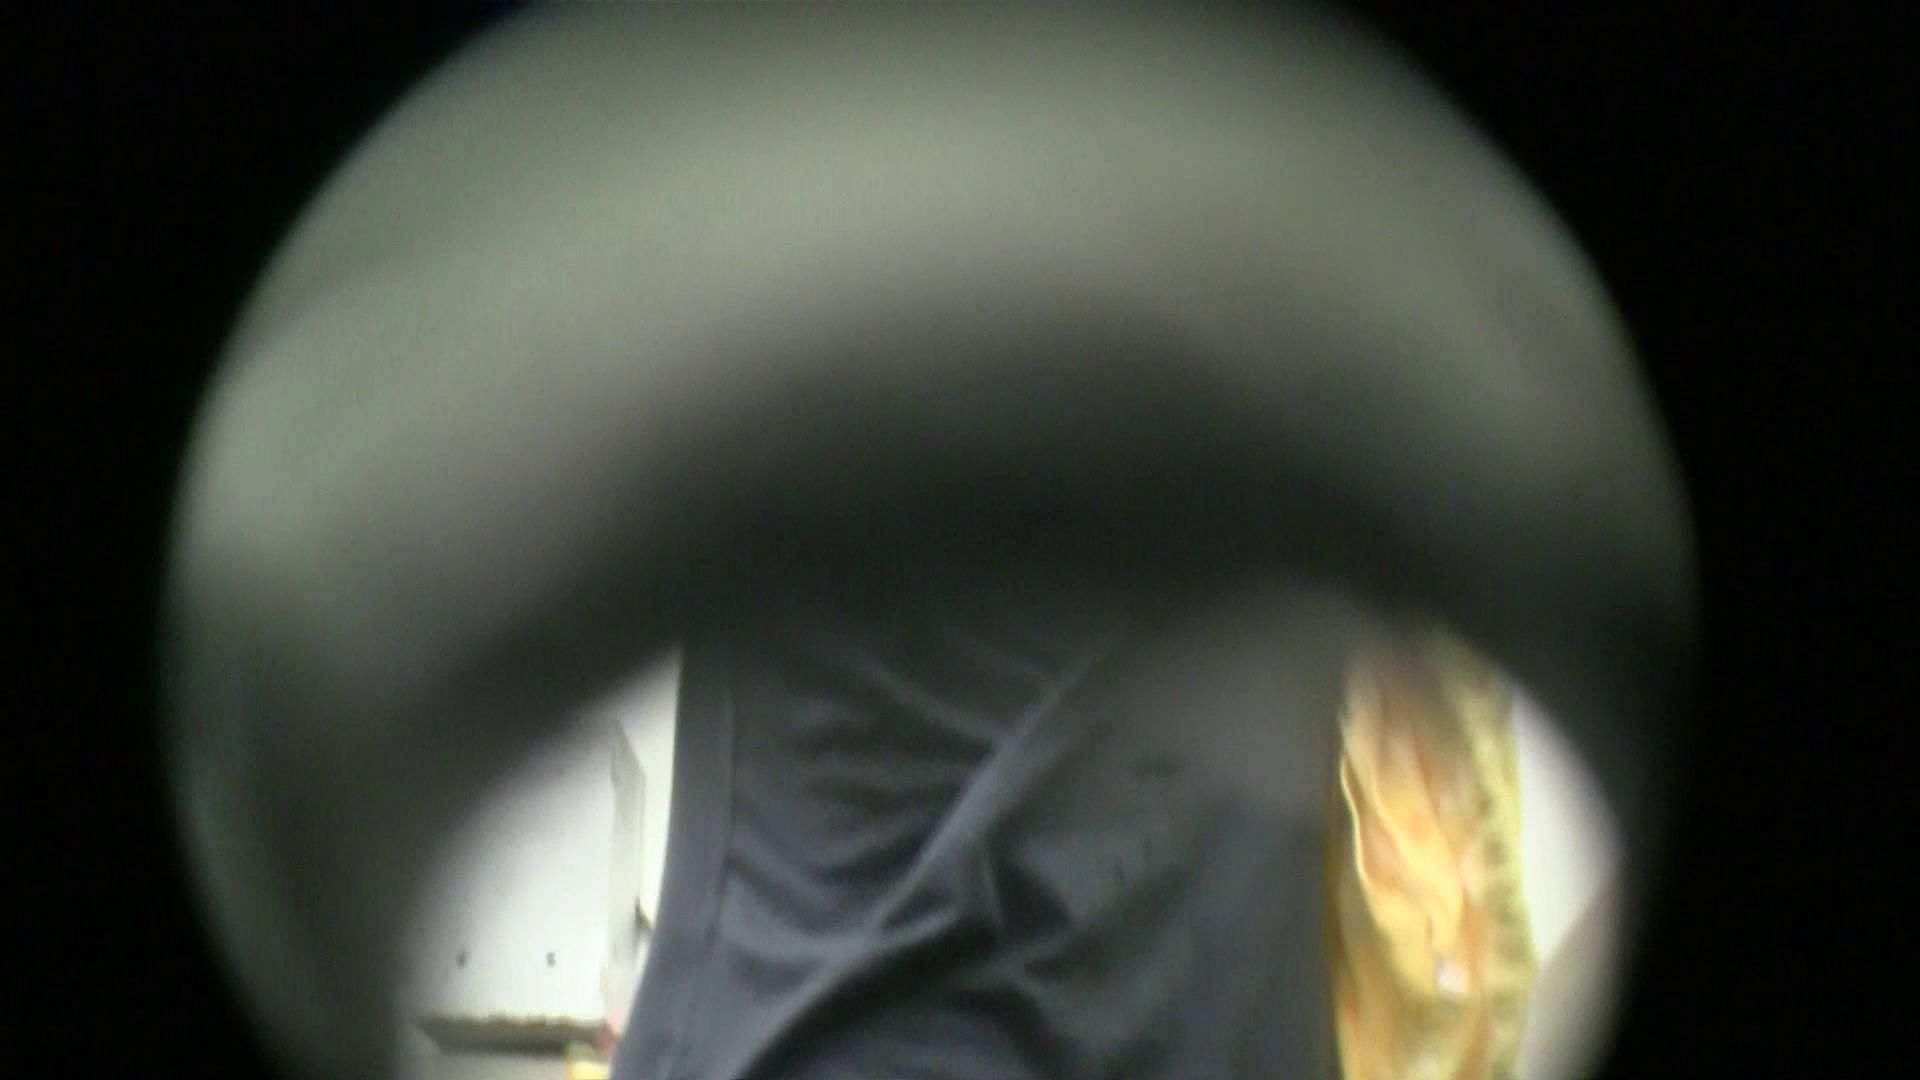 NO.43 乳首の先がチラ 背中でイメージして下さい チラ 盗み撮りAV無料動画キャプチャ 45pic 42